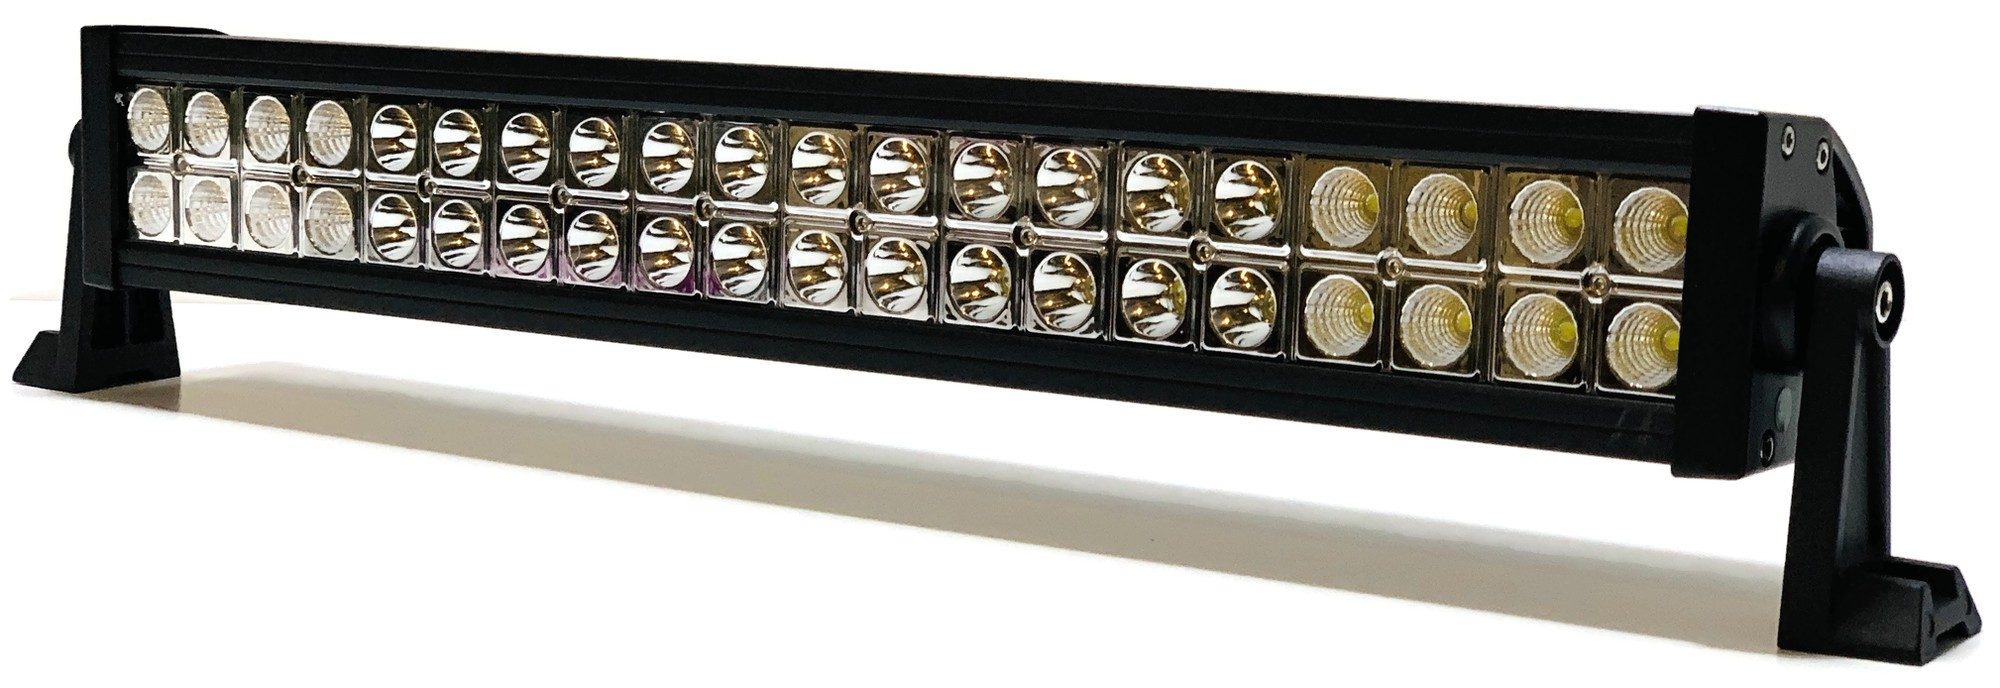 LAMPA 40 LED DALEKOSIĘŻNA LIGHTBAR COMBO 120W 9-32v